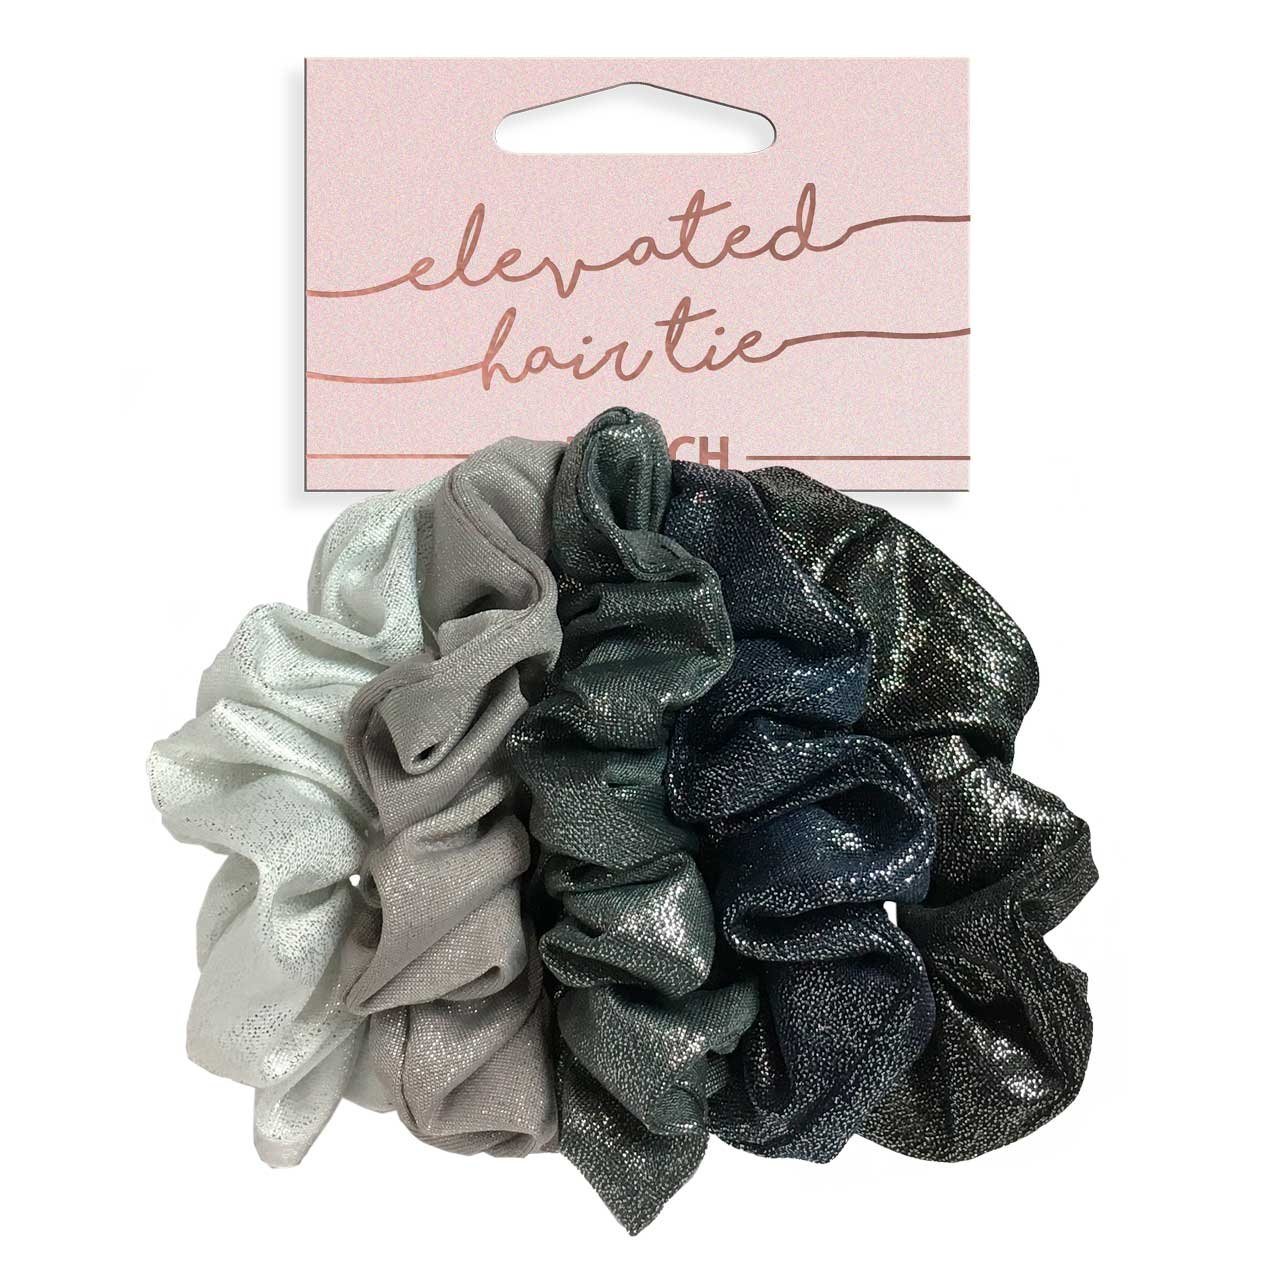 Kitsch Velvet Hair Scrunchies, Cute Suede-Look Scrunchies for Ponytails, Top Knots, Braids and Buns, 5 Count (Velvet Pastel/Blush/Mauve)